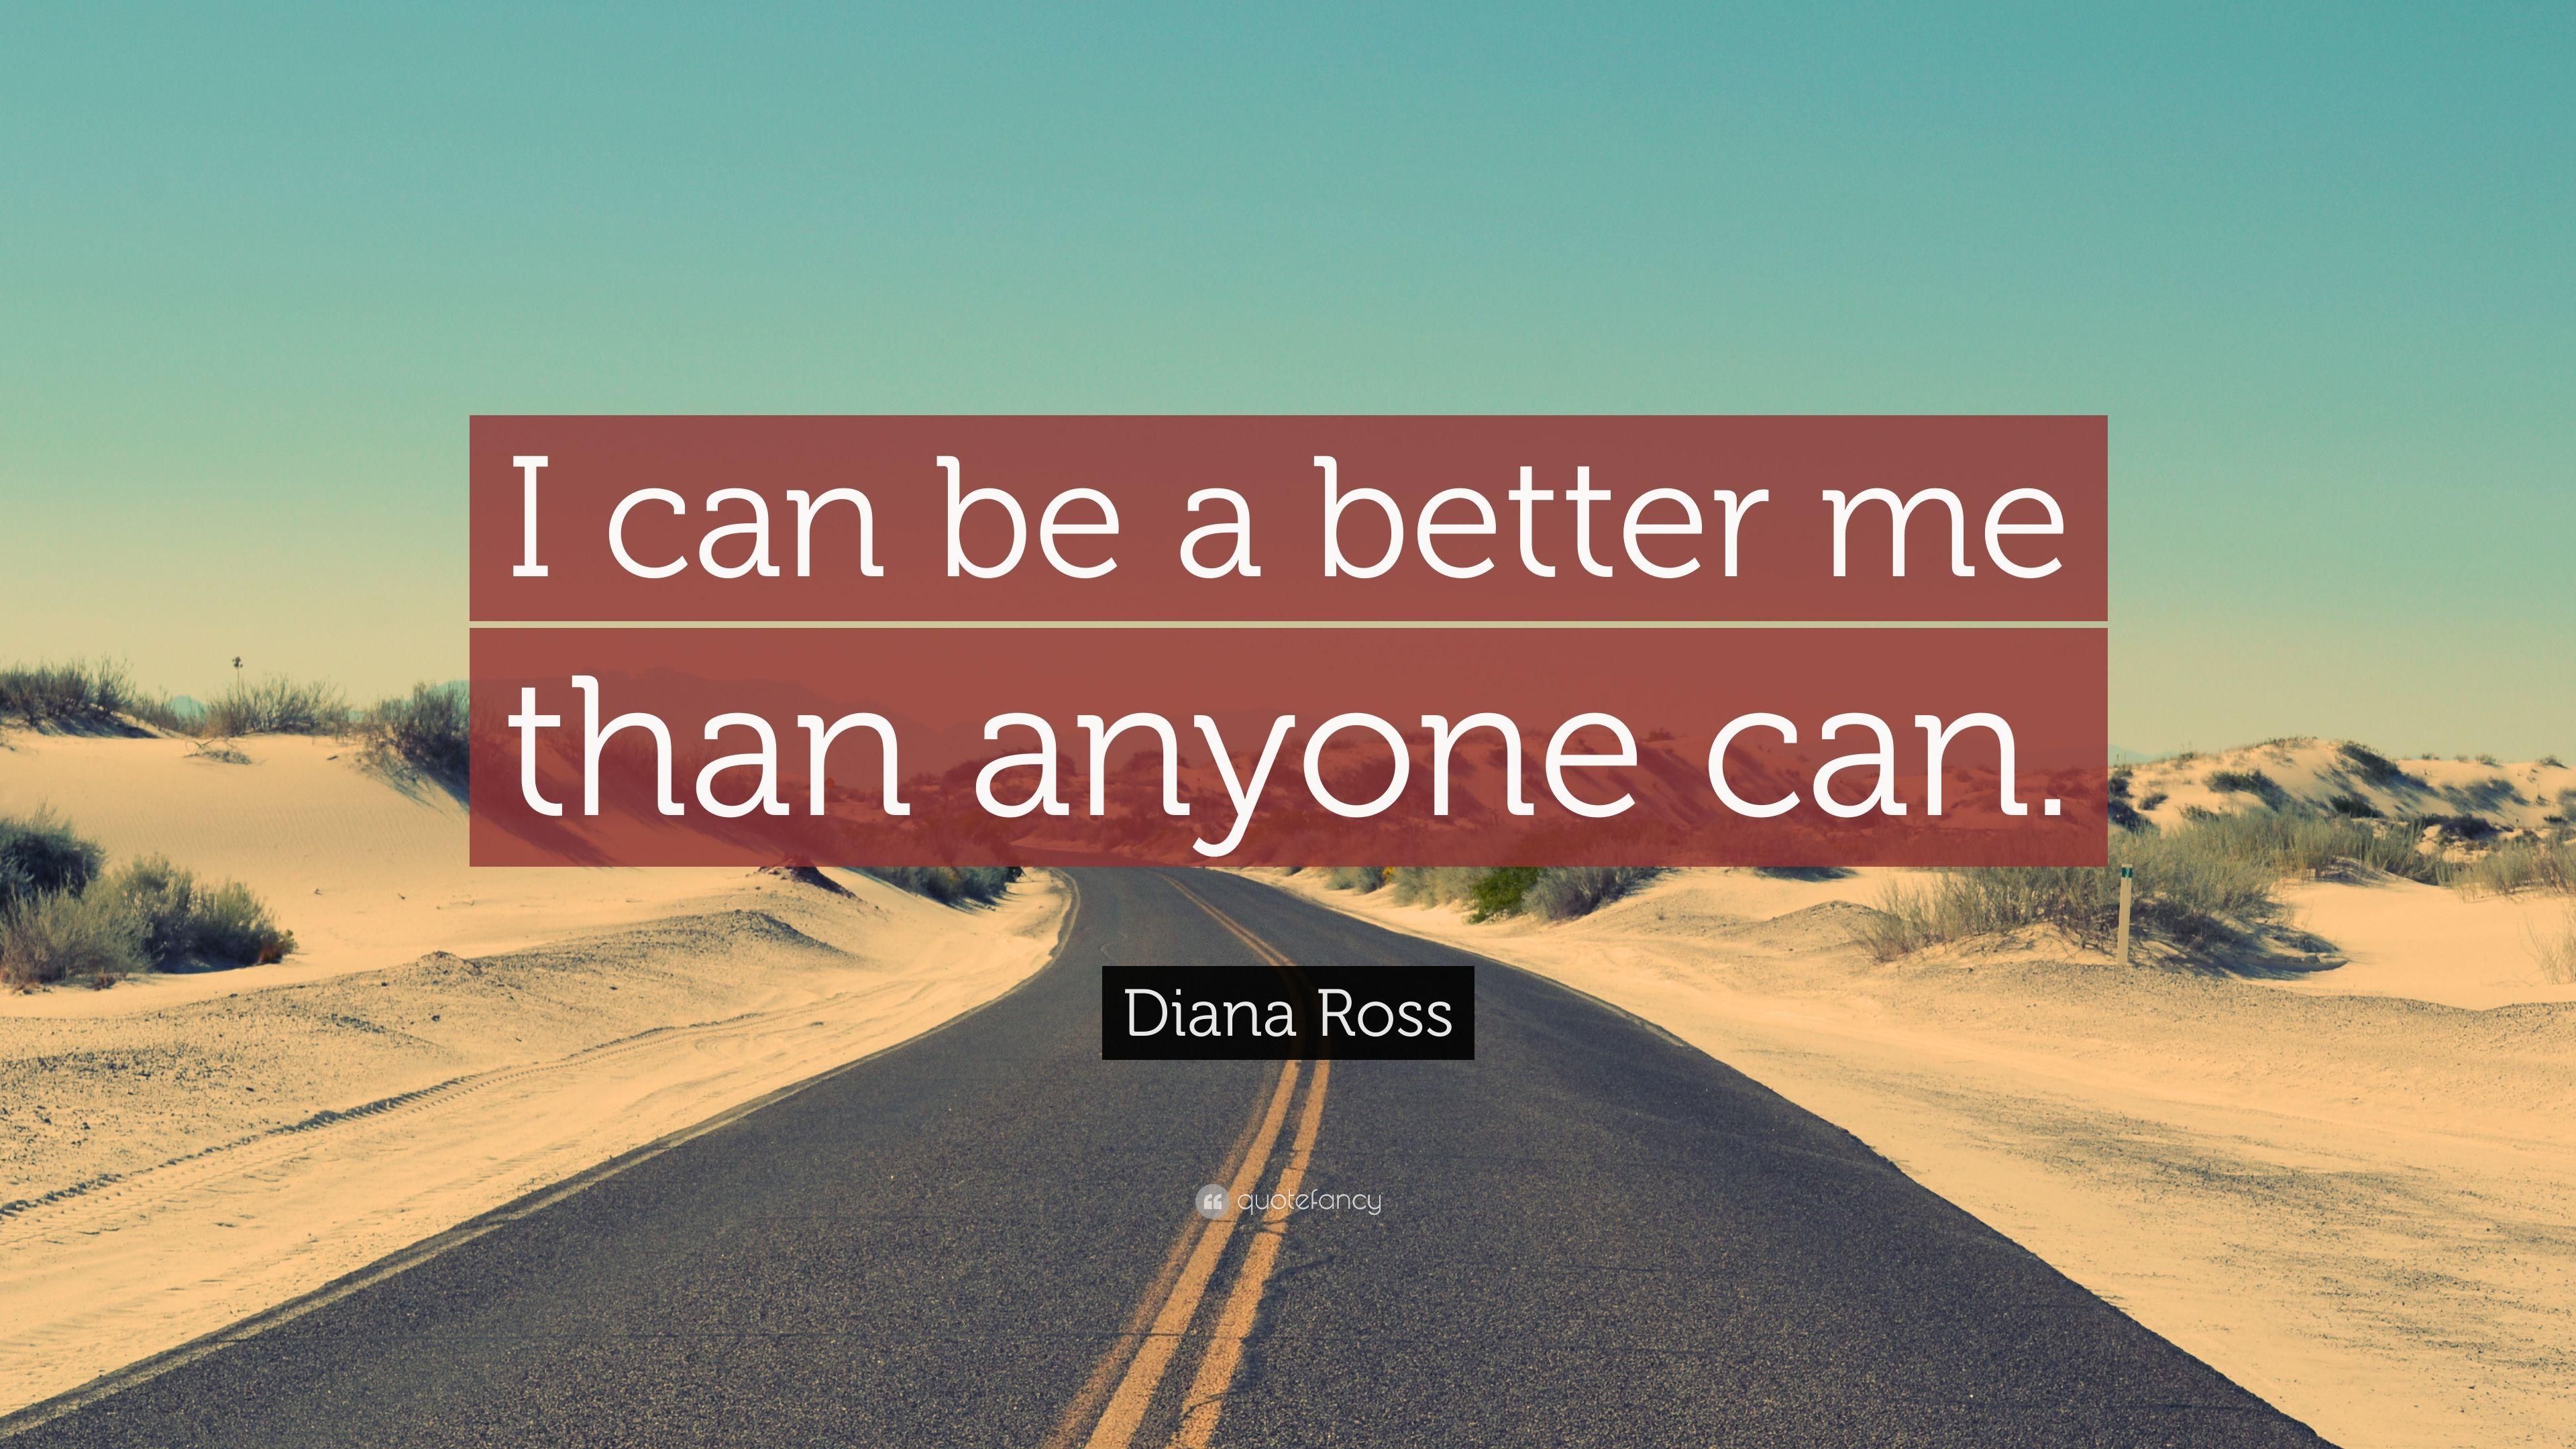 #DianaRoss #Quotes